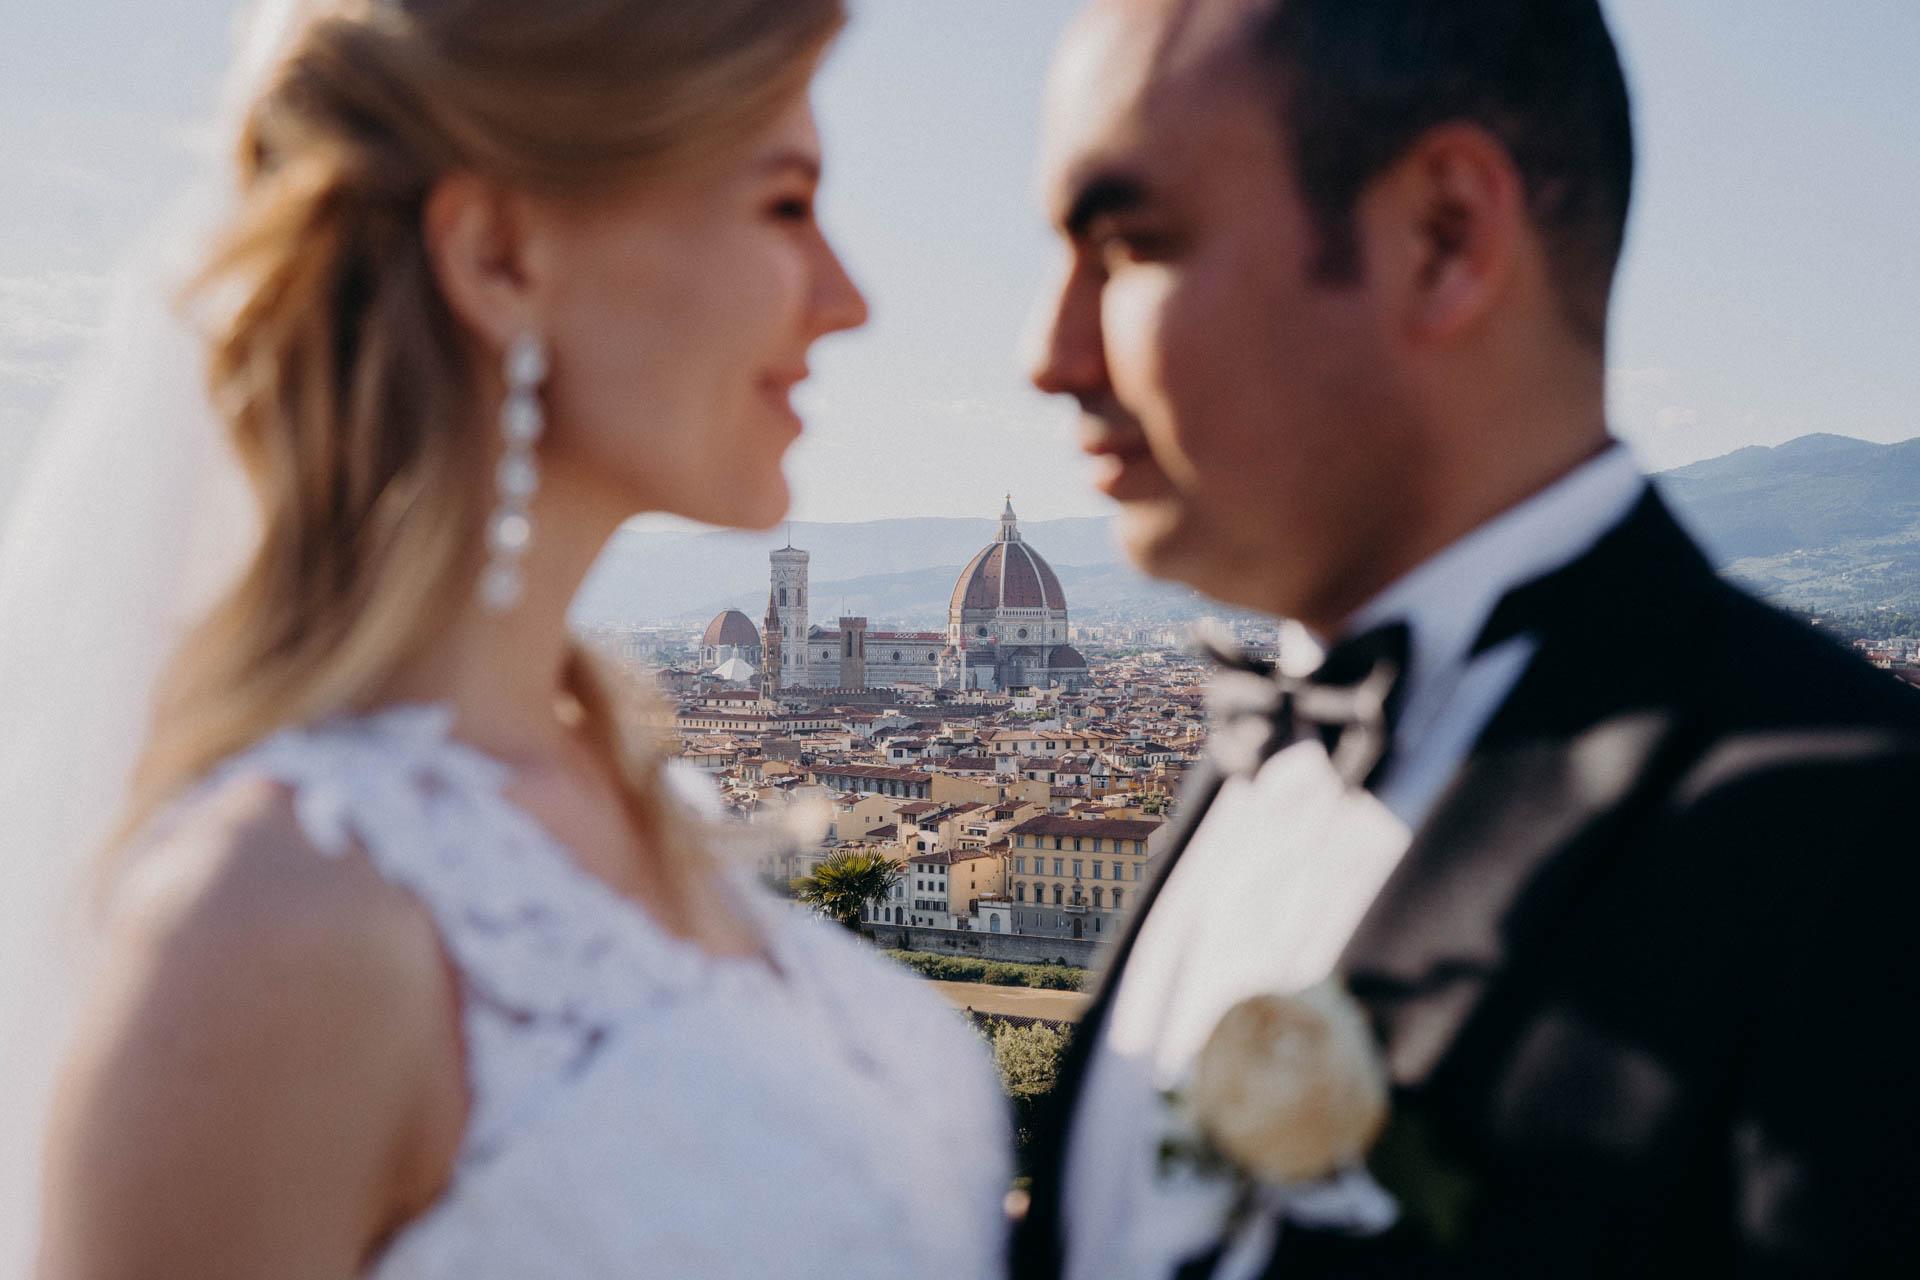 fotografo_matrimonio_firenze_44